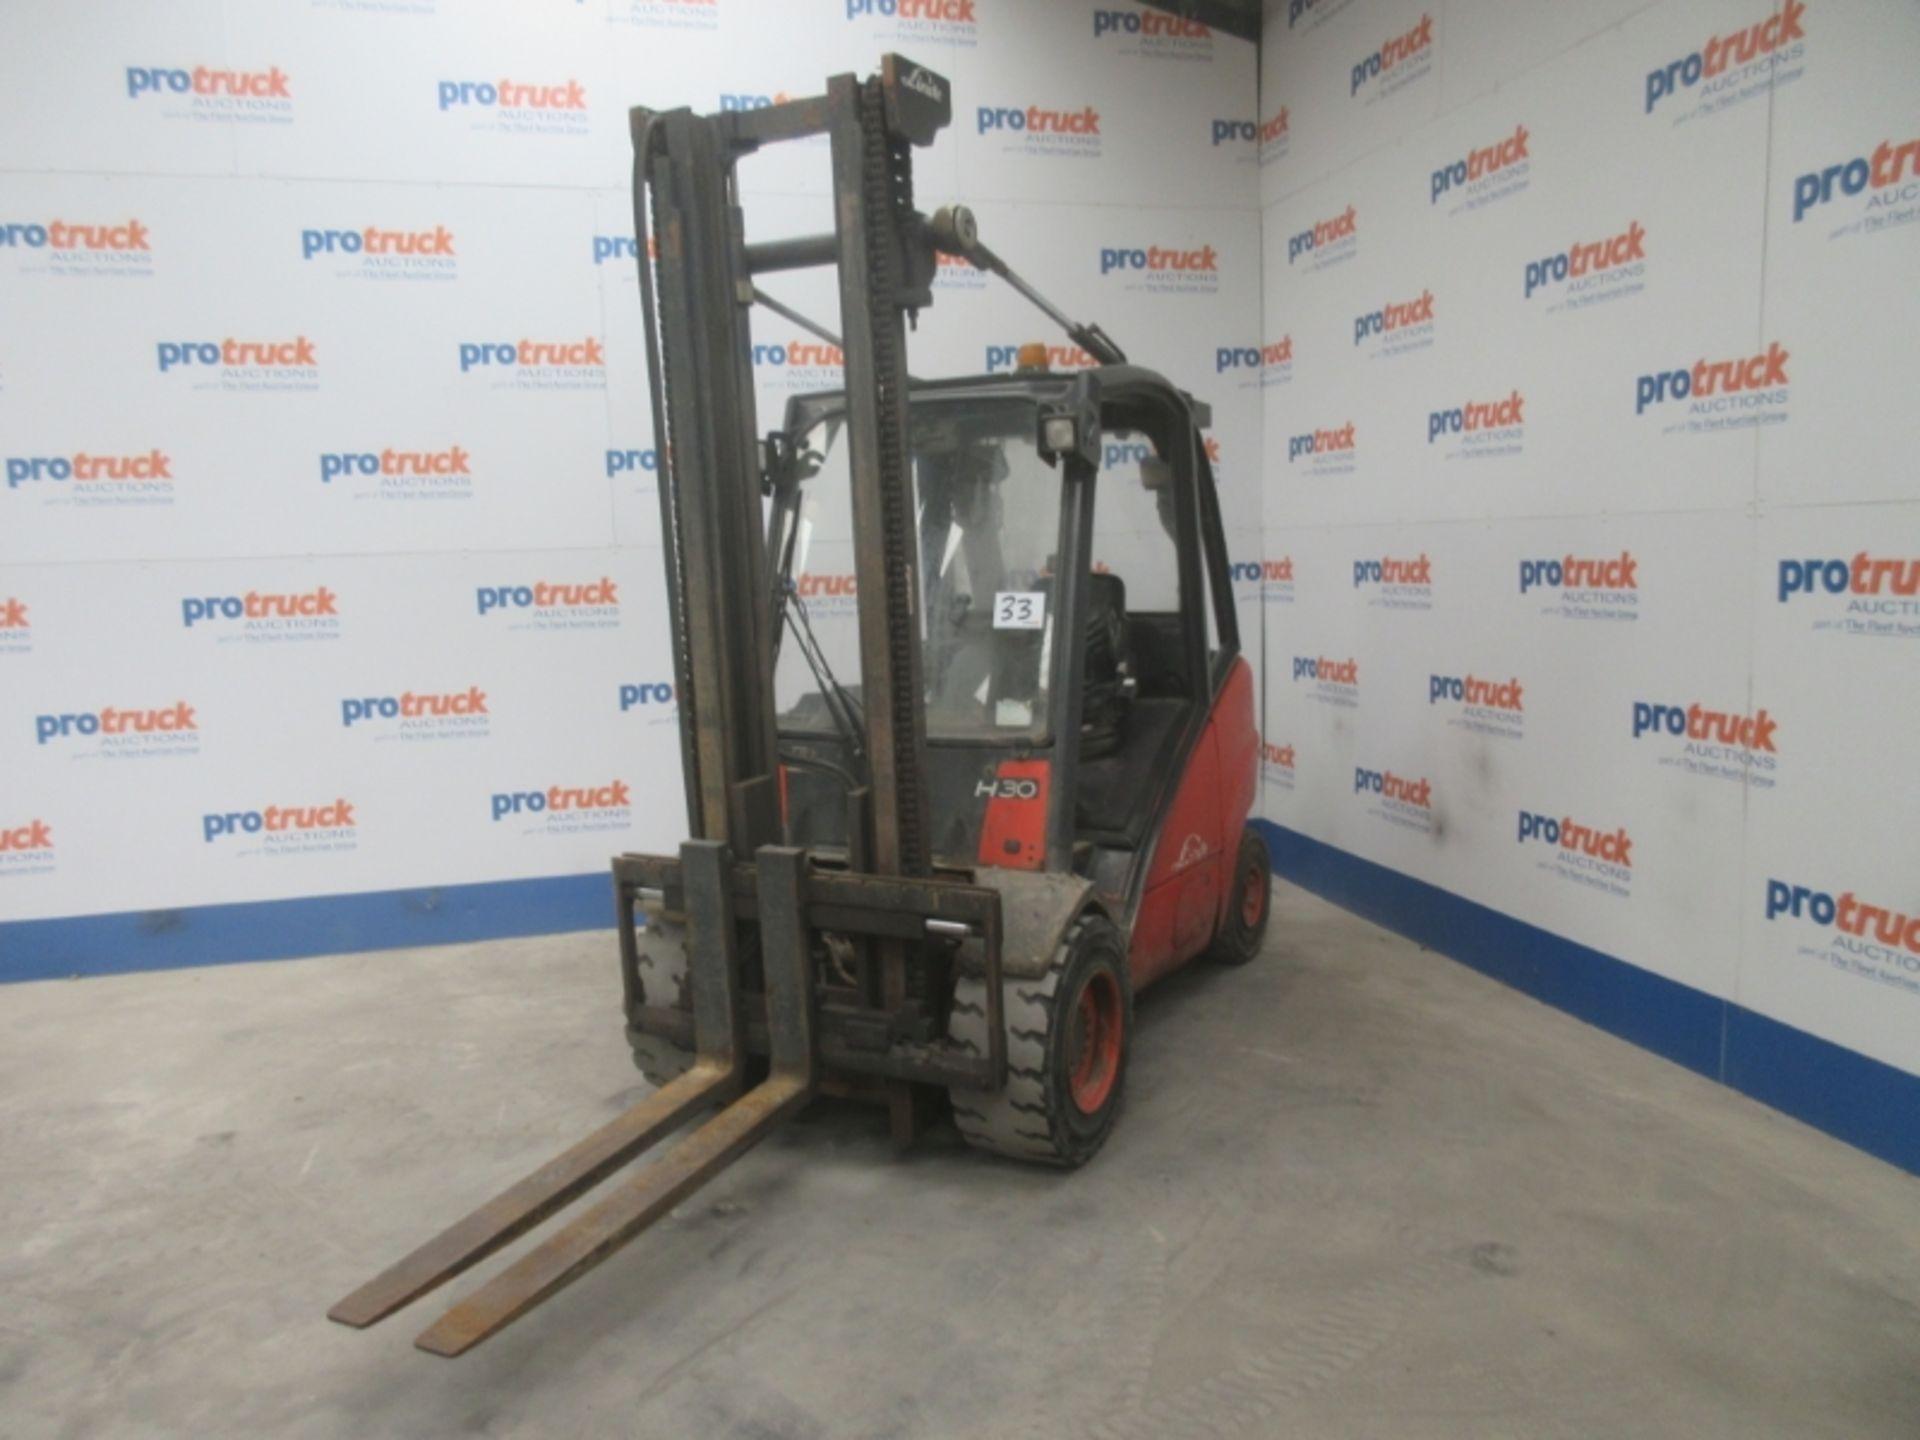 Lot 33 - LINDE H30D Plant Diesel - VIN: H2X393T04473 - Year: 2006 - 11,012 Hours - Duplex Forklift,